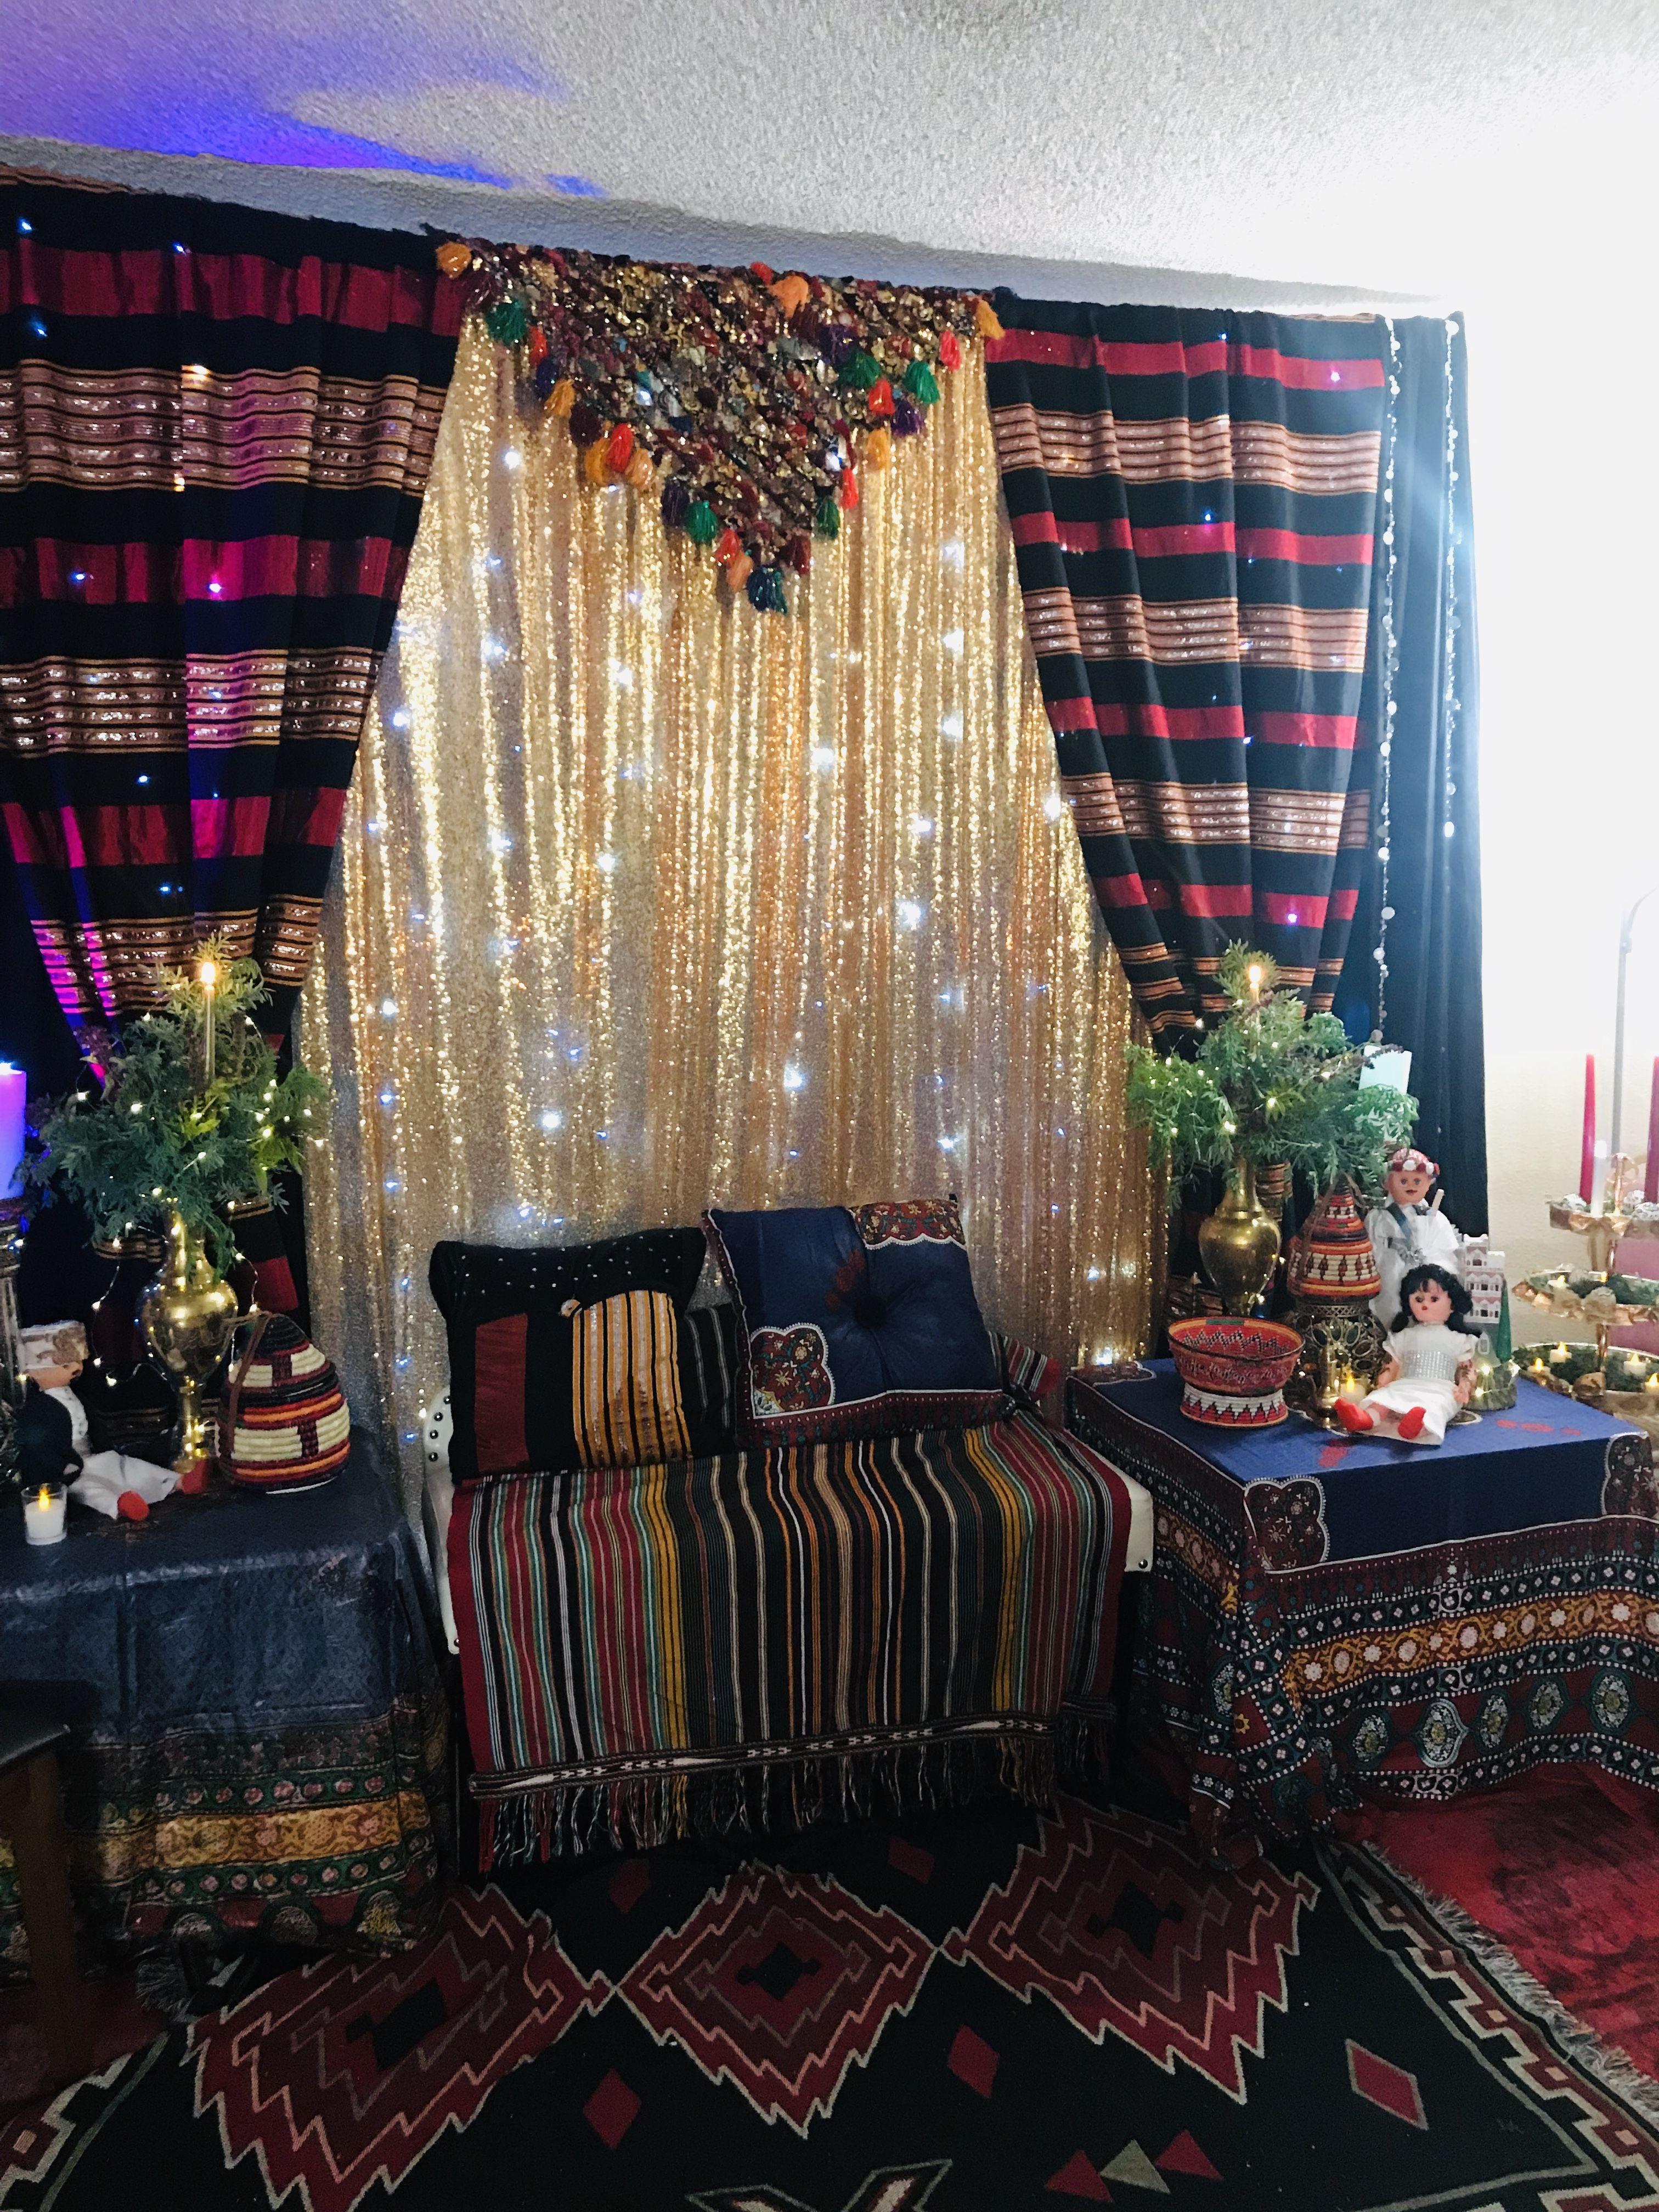 Pin By طيف عابر On Yemen Wedding Design Decoration Wedding Stage Decorations Wedding Event Decor